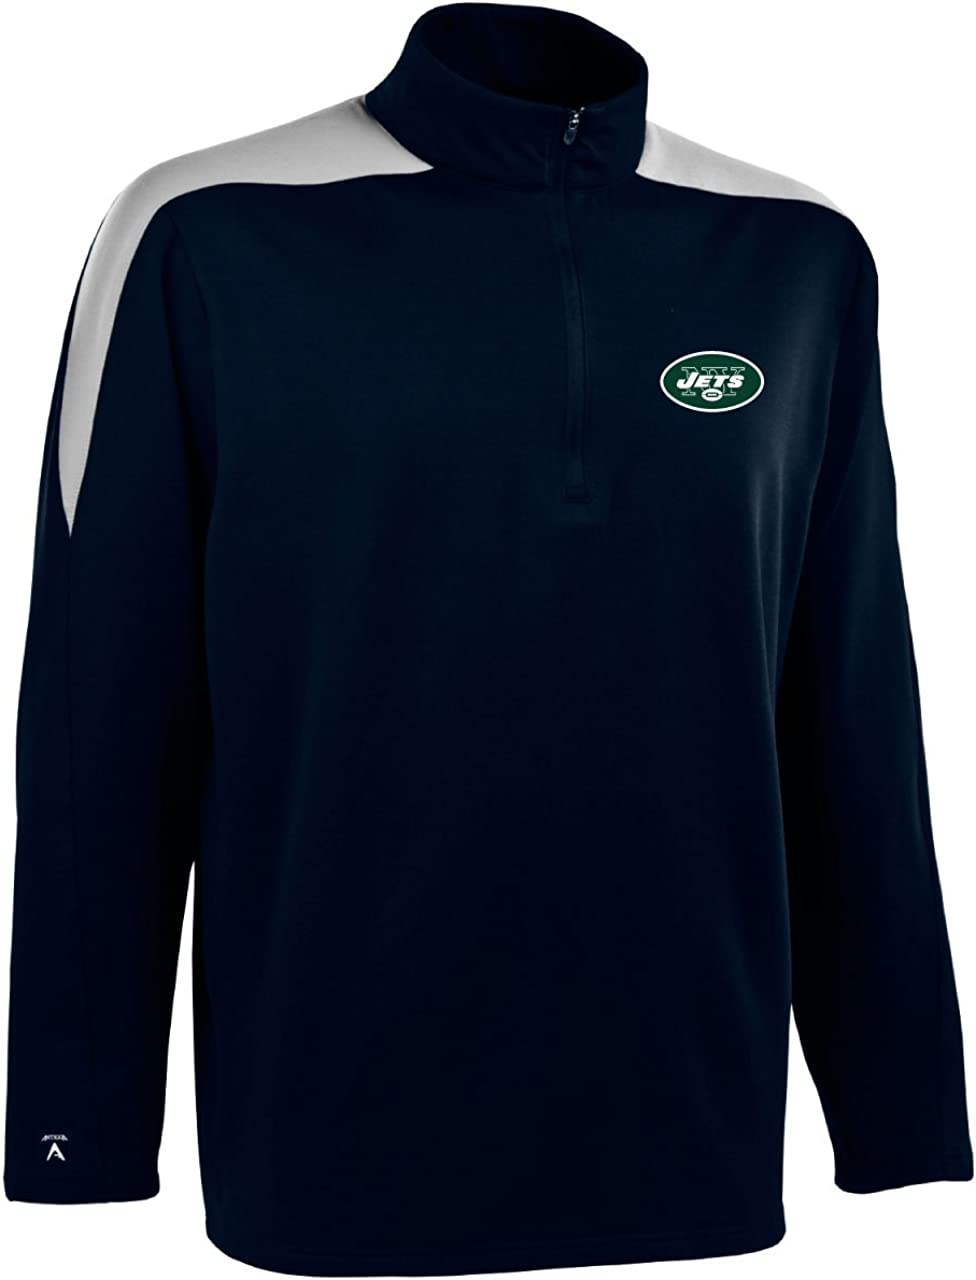 Limited price sale NFL Men's New York Sacramento Mall Jets Zip Pullover Jersey 1 2